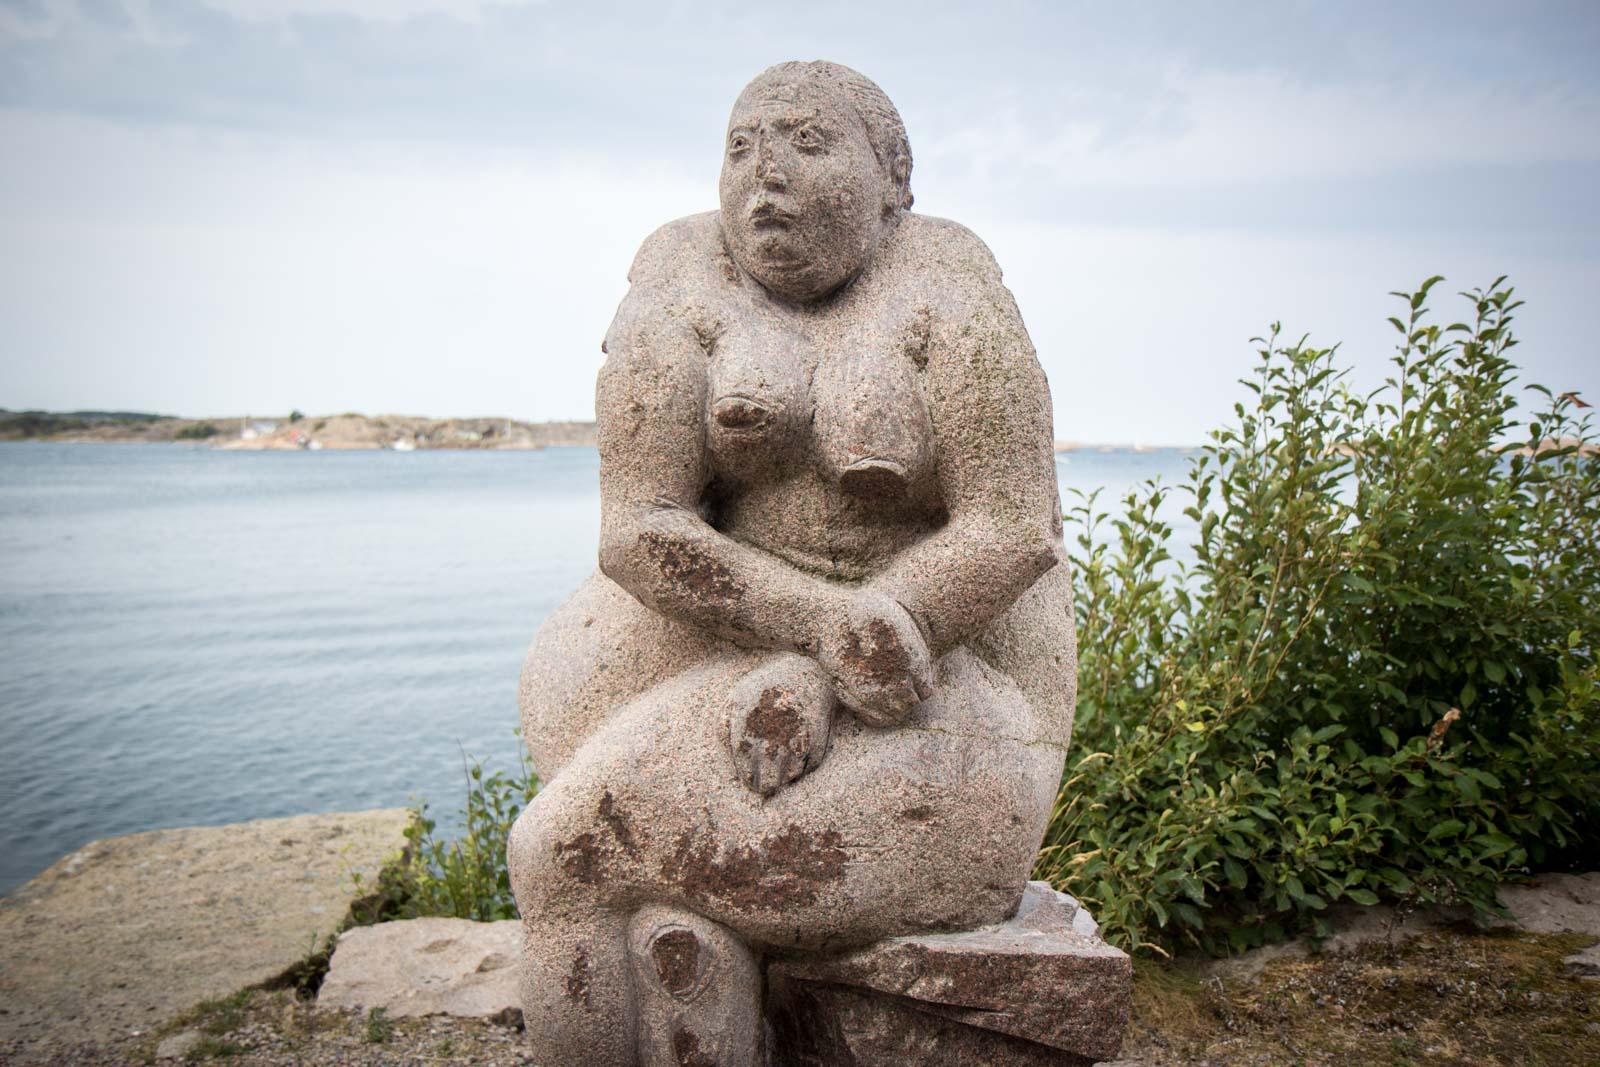 Udden stone sculptures, Hunnebostrand, Sweden